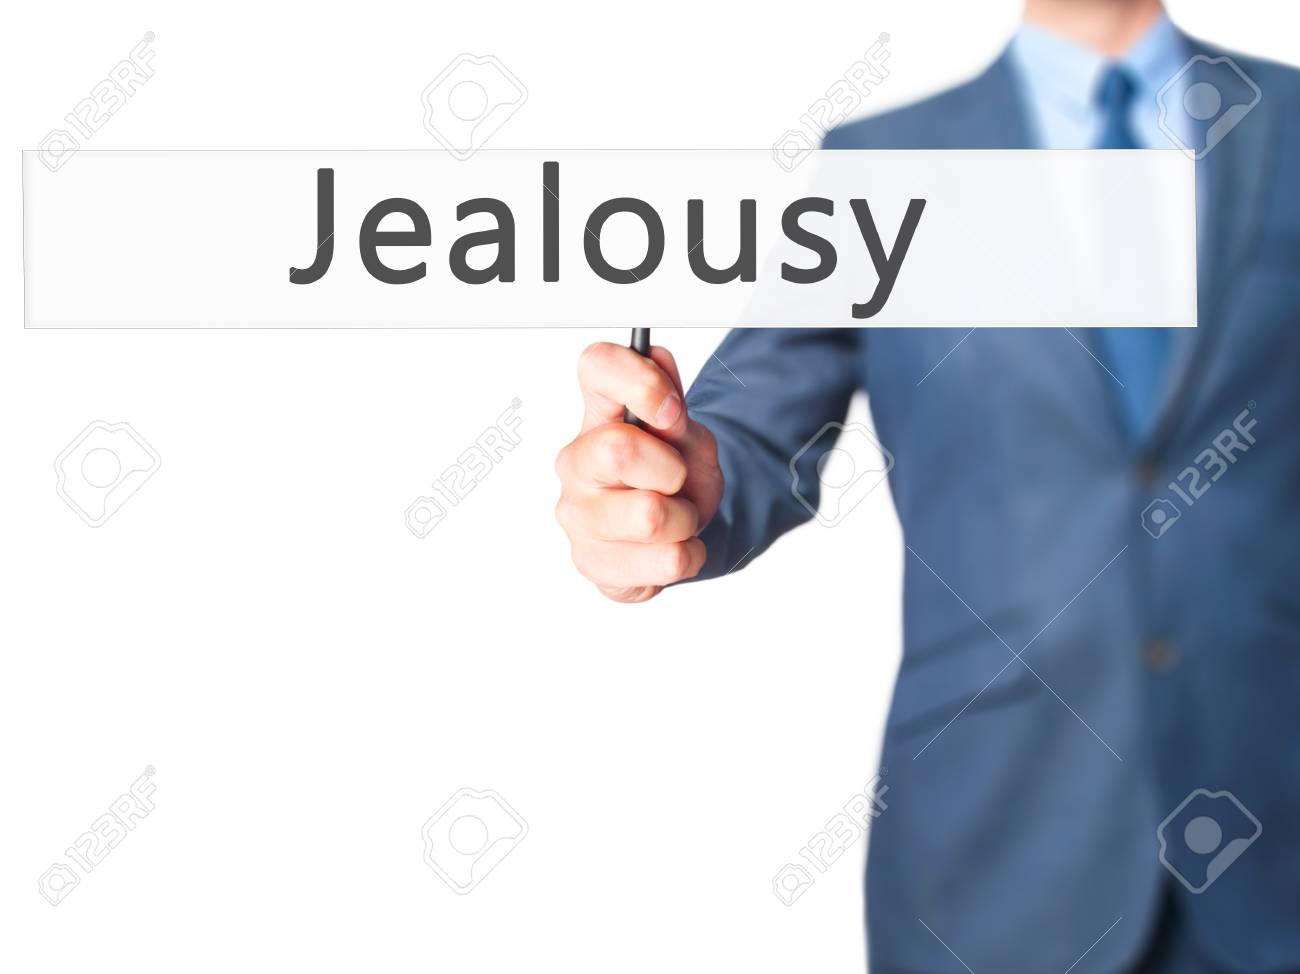 Jealousy - Businessman hand holding sign  Business, technology,